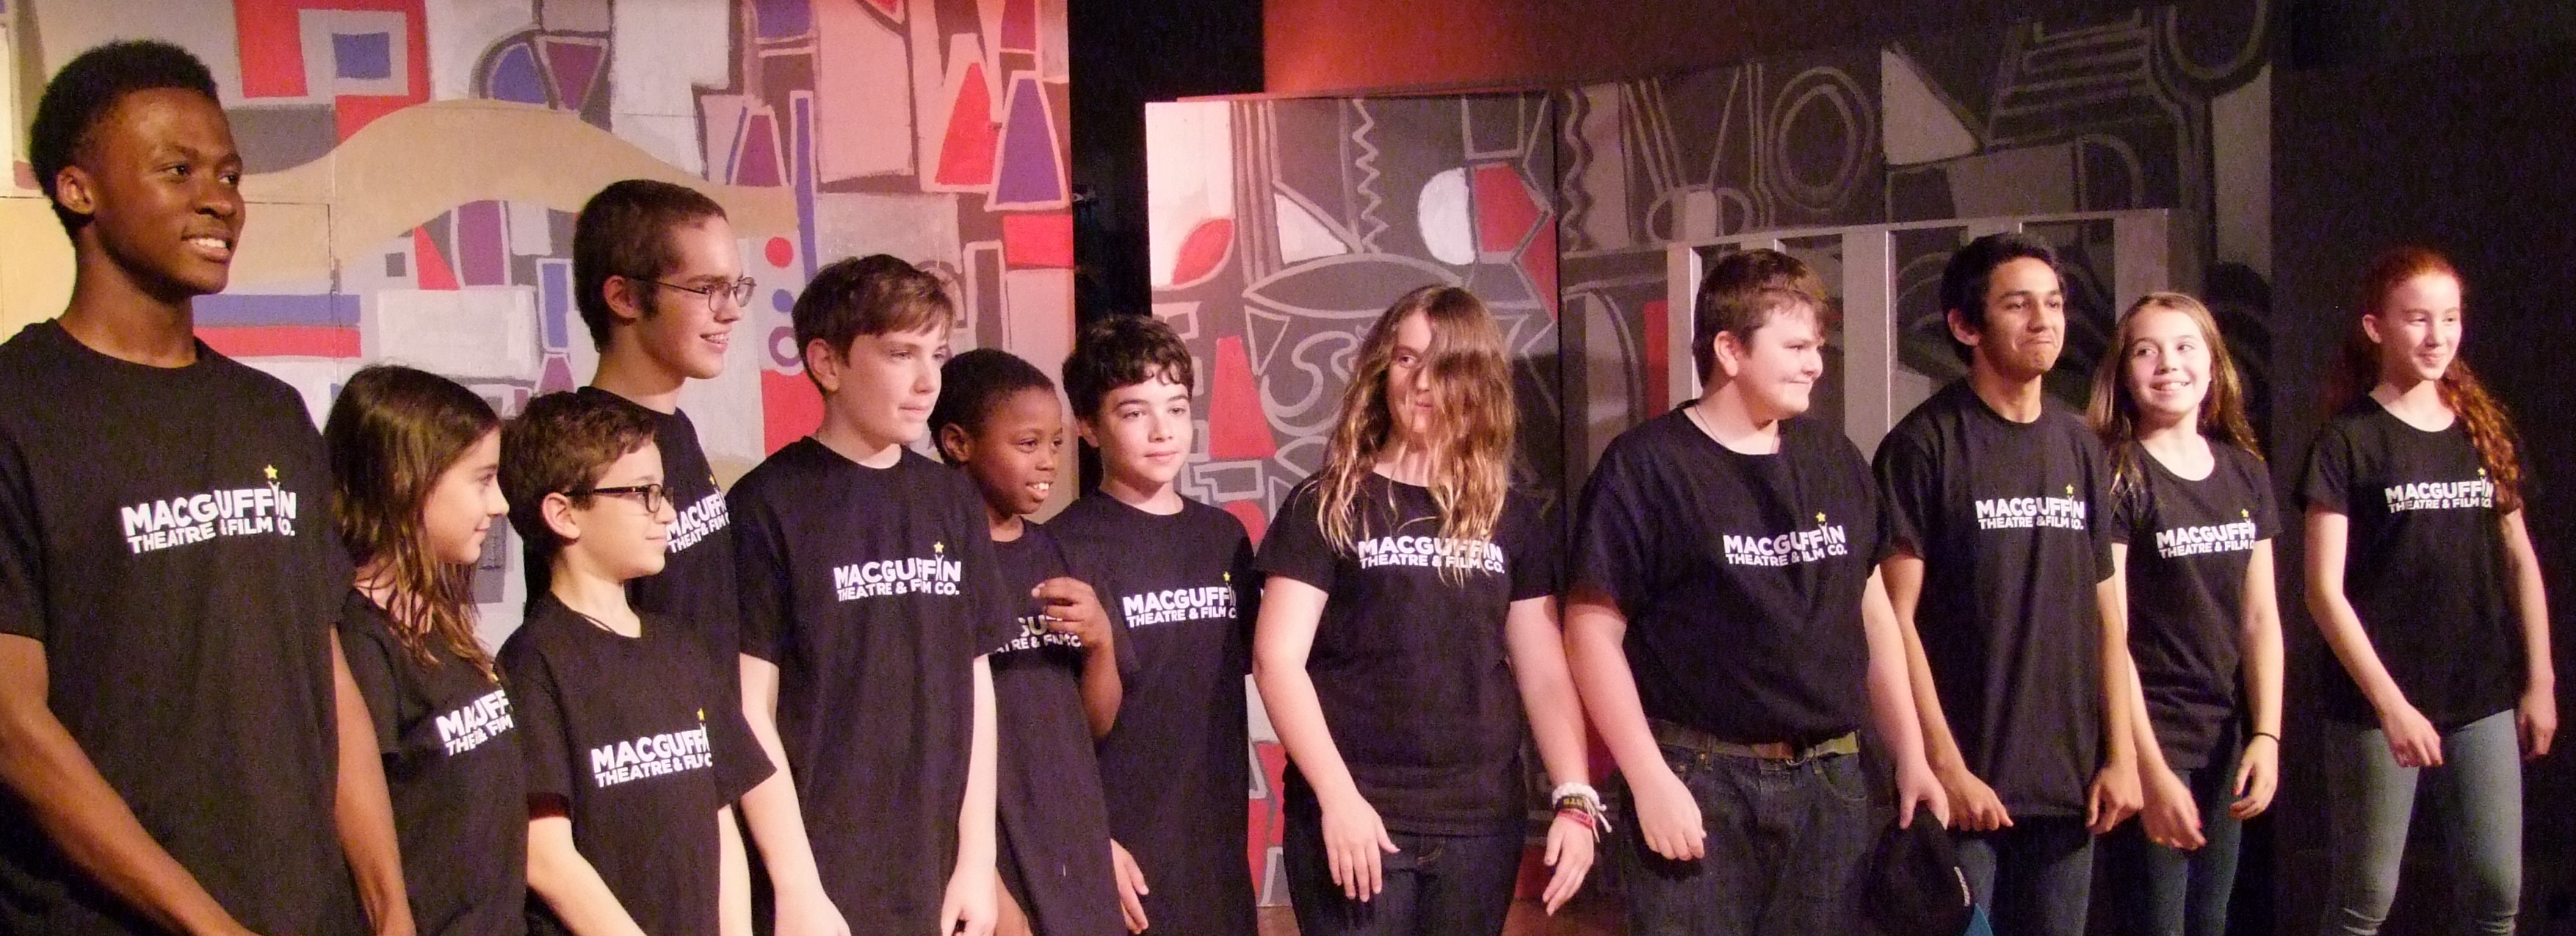 MacGuffin Theatre and Film Company: Comedy Camp